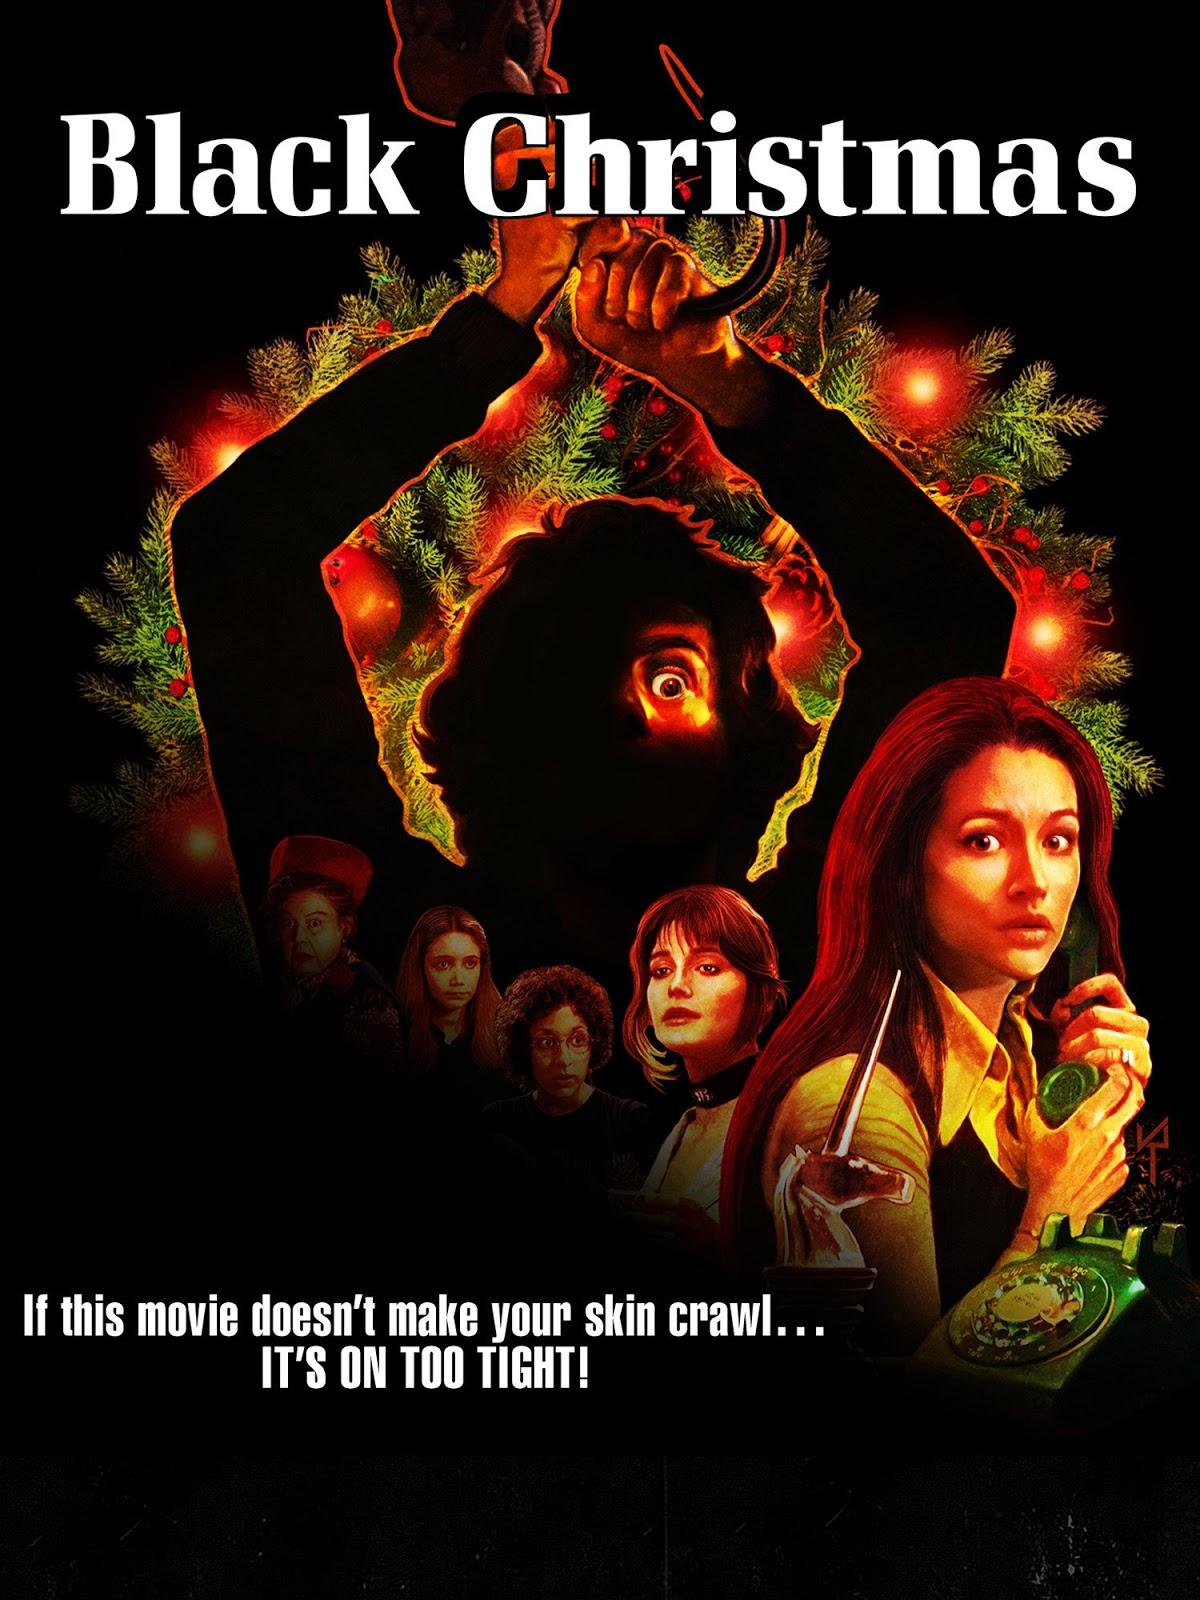 Black Christmas [2006] [DVDR] [NTSC] [Subtitulado]